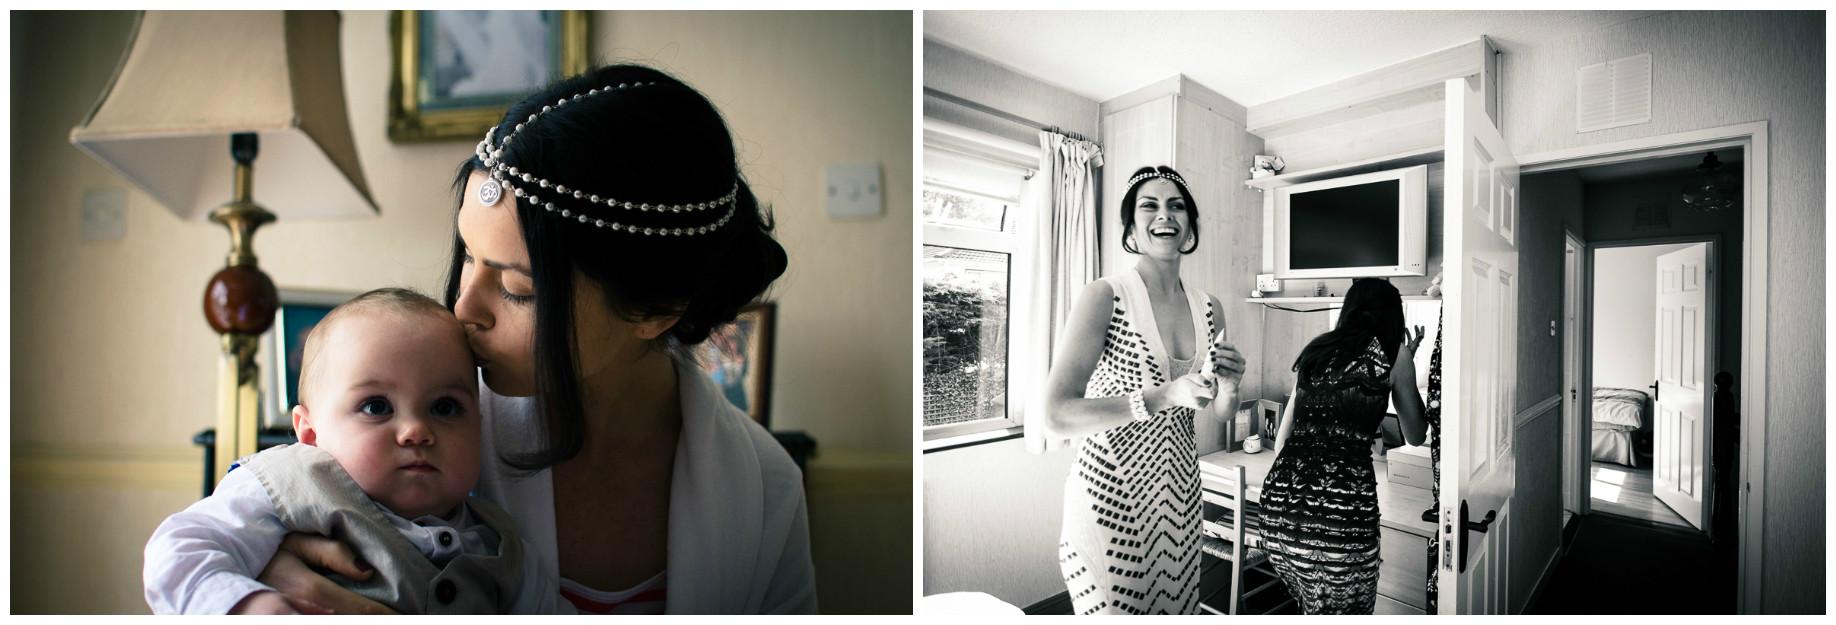 Firechild_Photography_Wedding_Dublin_Ireland_preparations